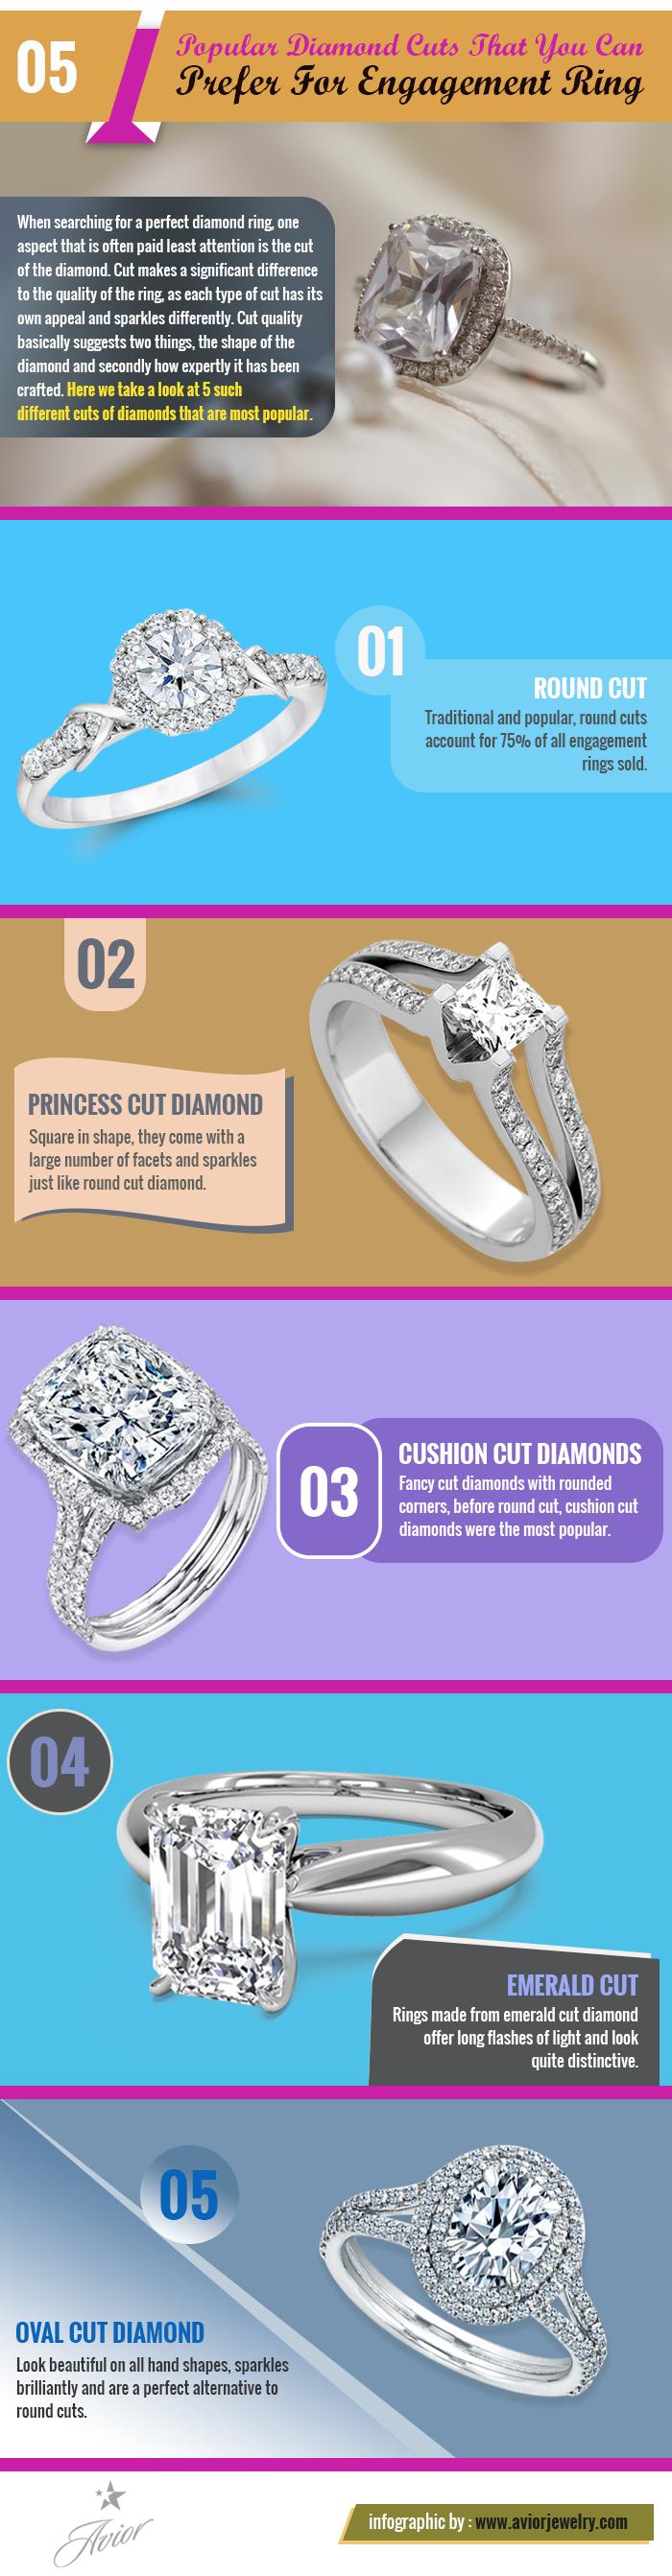 Aviorjewelry Infographics.png